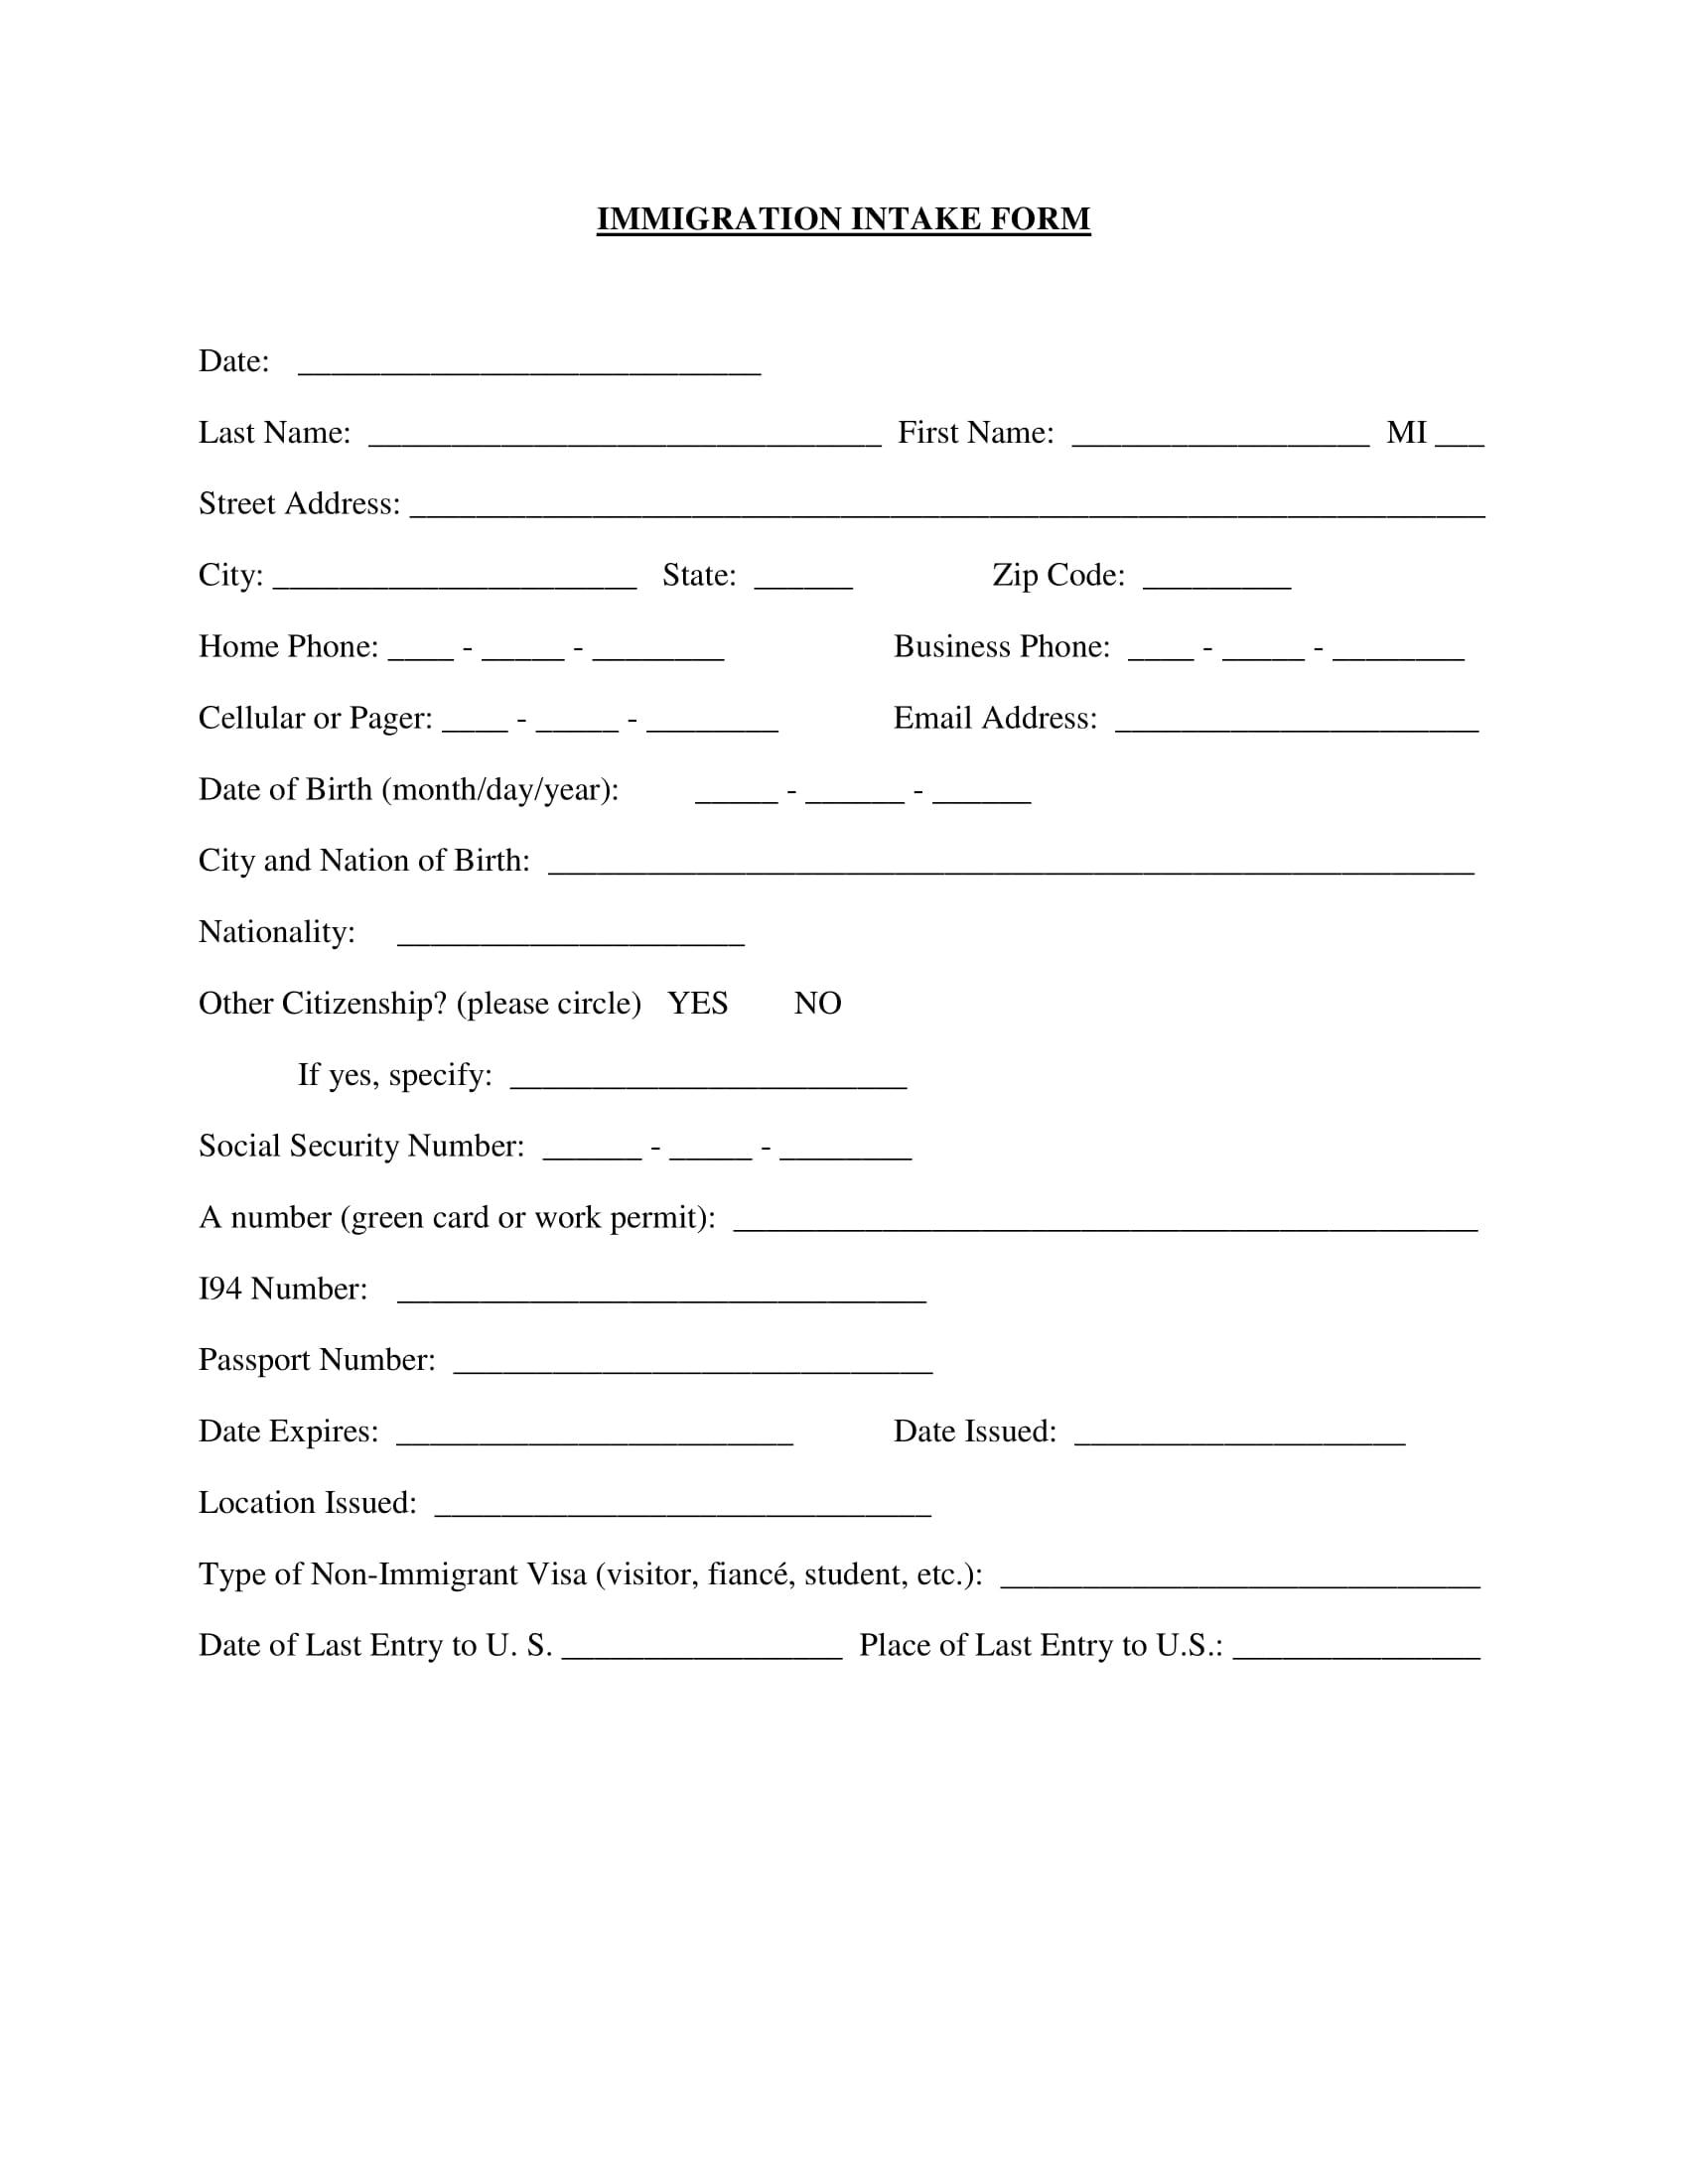 basic immigration intake form 1